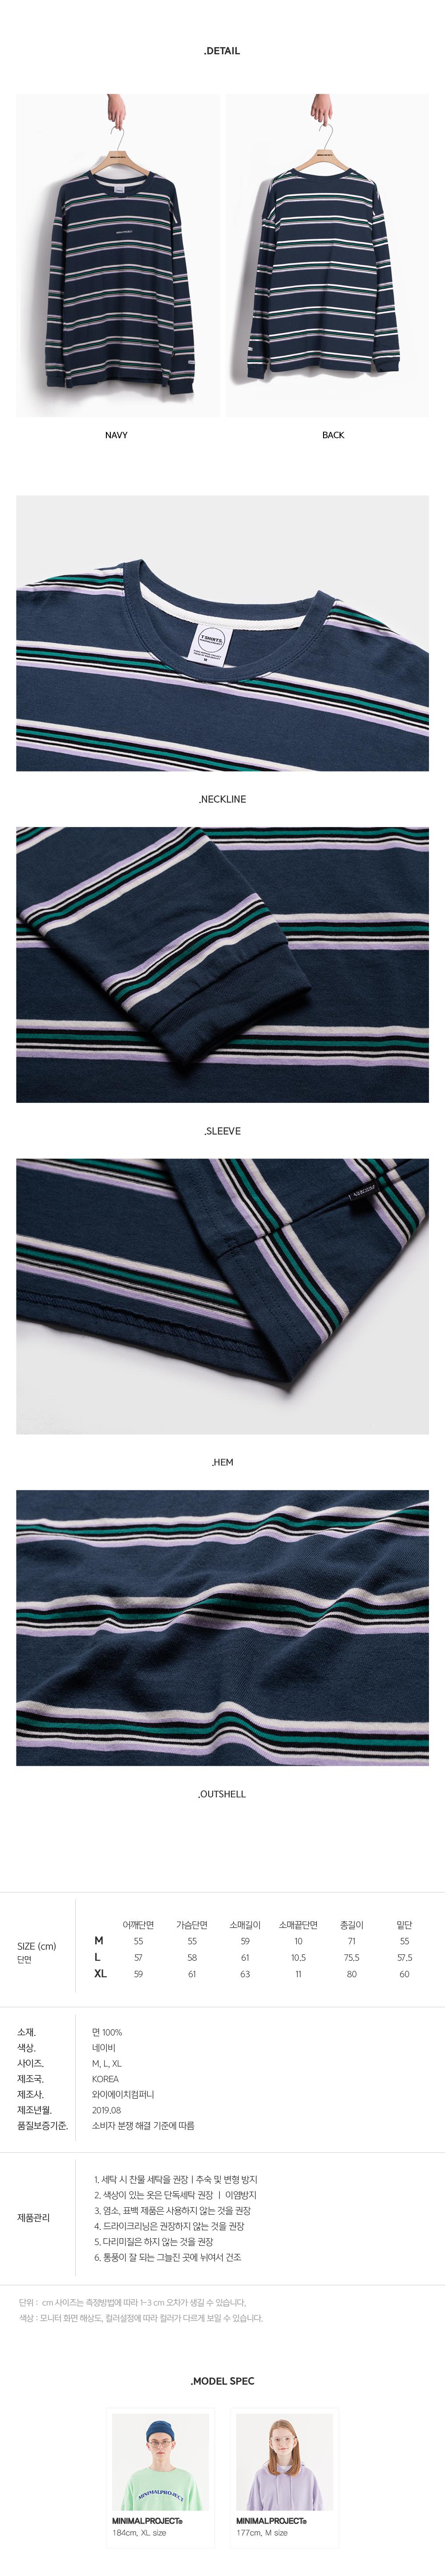 [minimal project] 미니멀프로젝트 멀티 스트라이프 오버핏 롱 슬리브 티셔츠 MLT106 [NAVY]